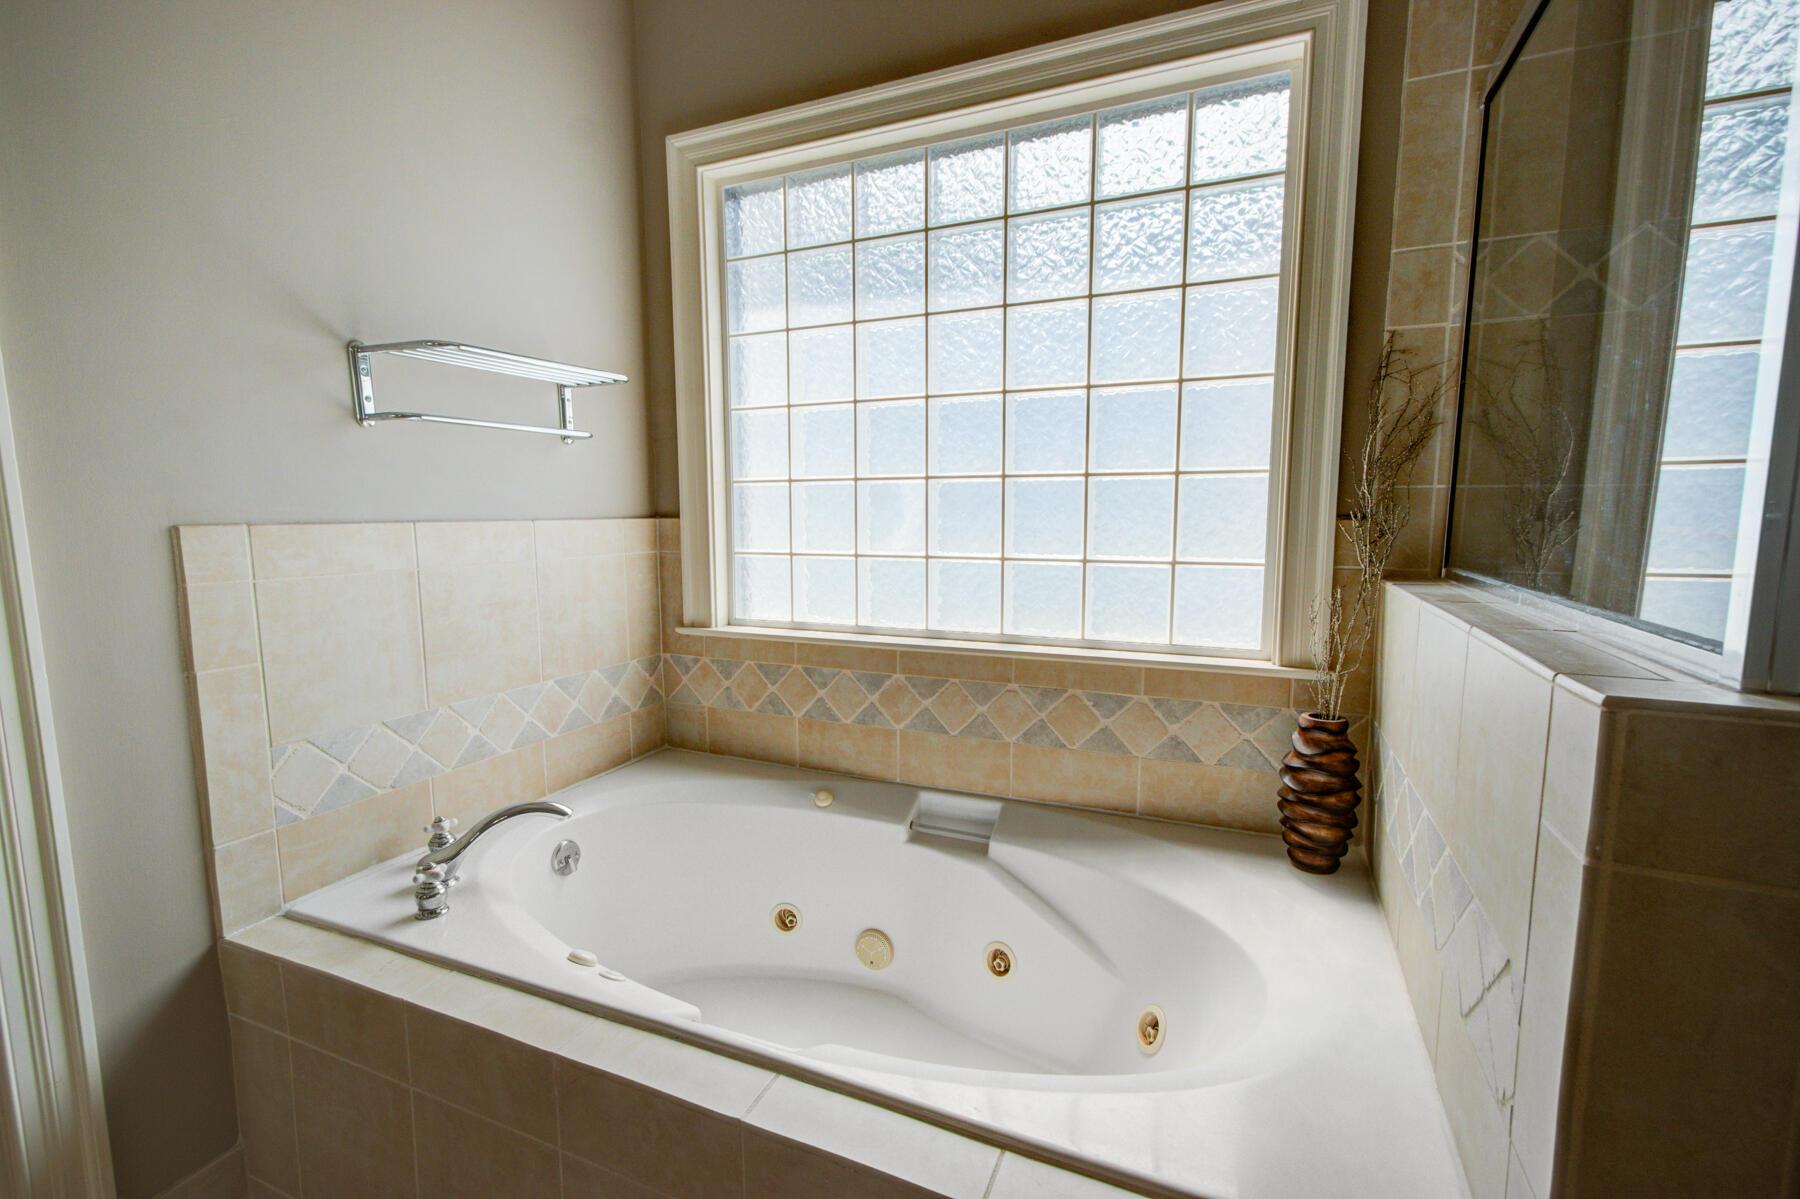 Dunes West Homes For Sale - 3095 Pignatelli, Mount Pleasant, SC - 2